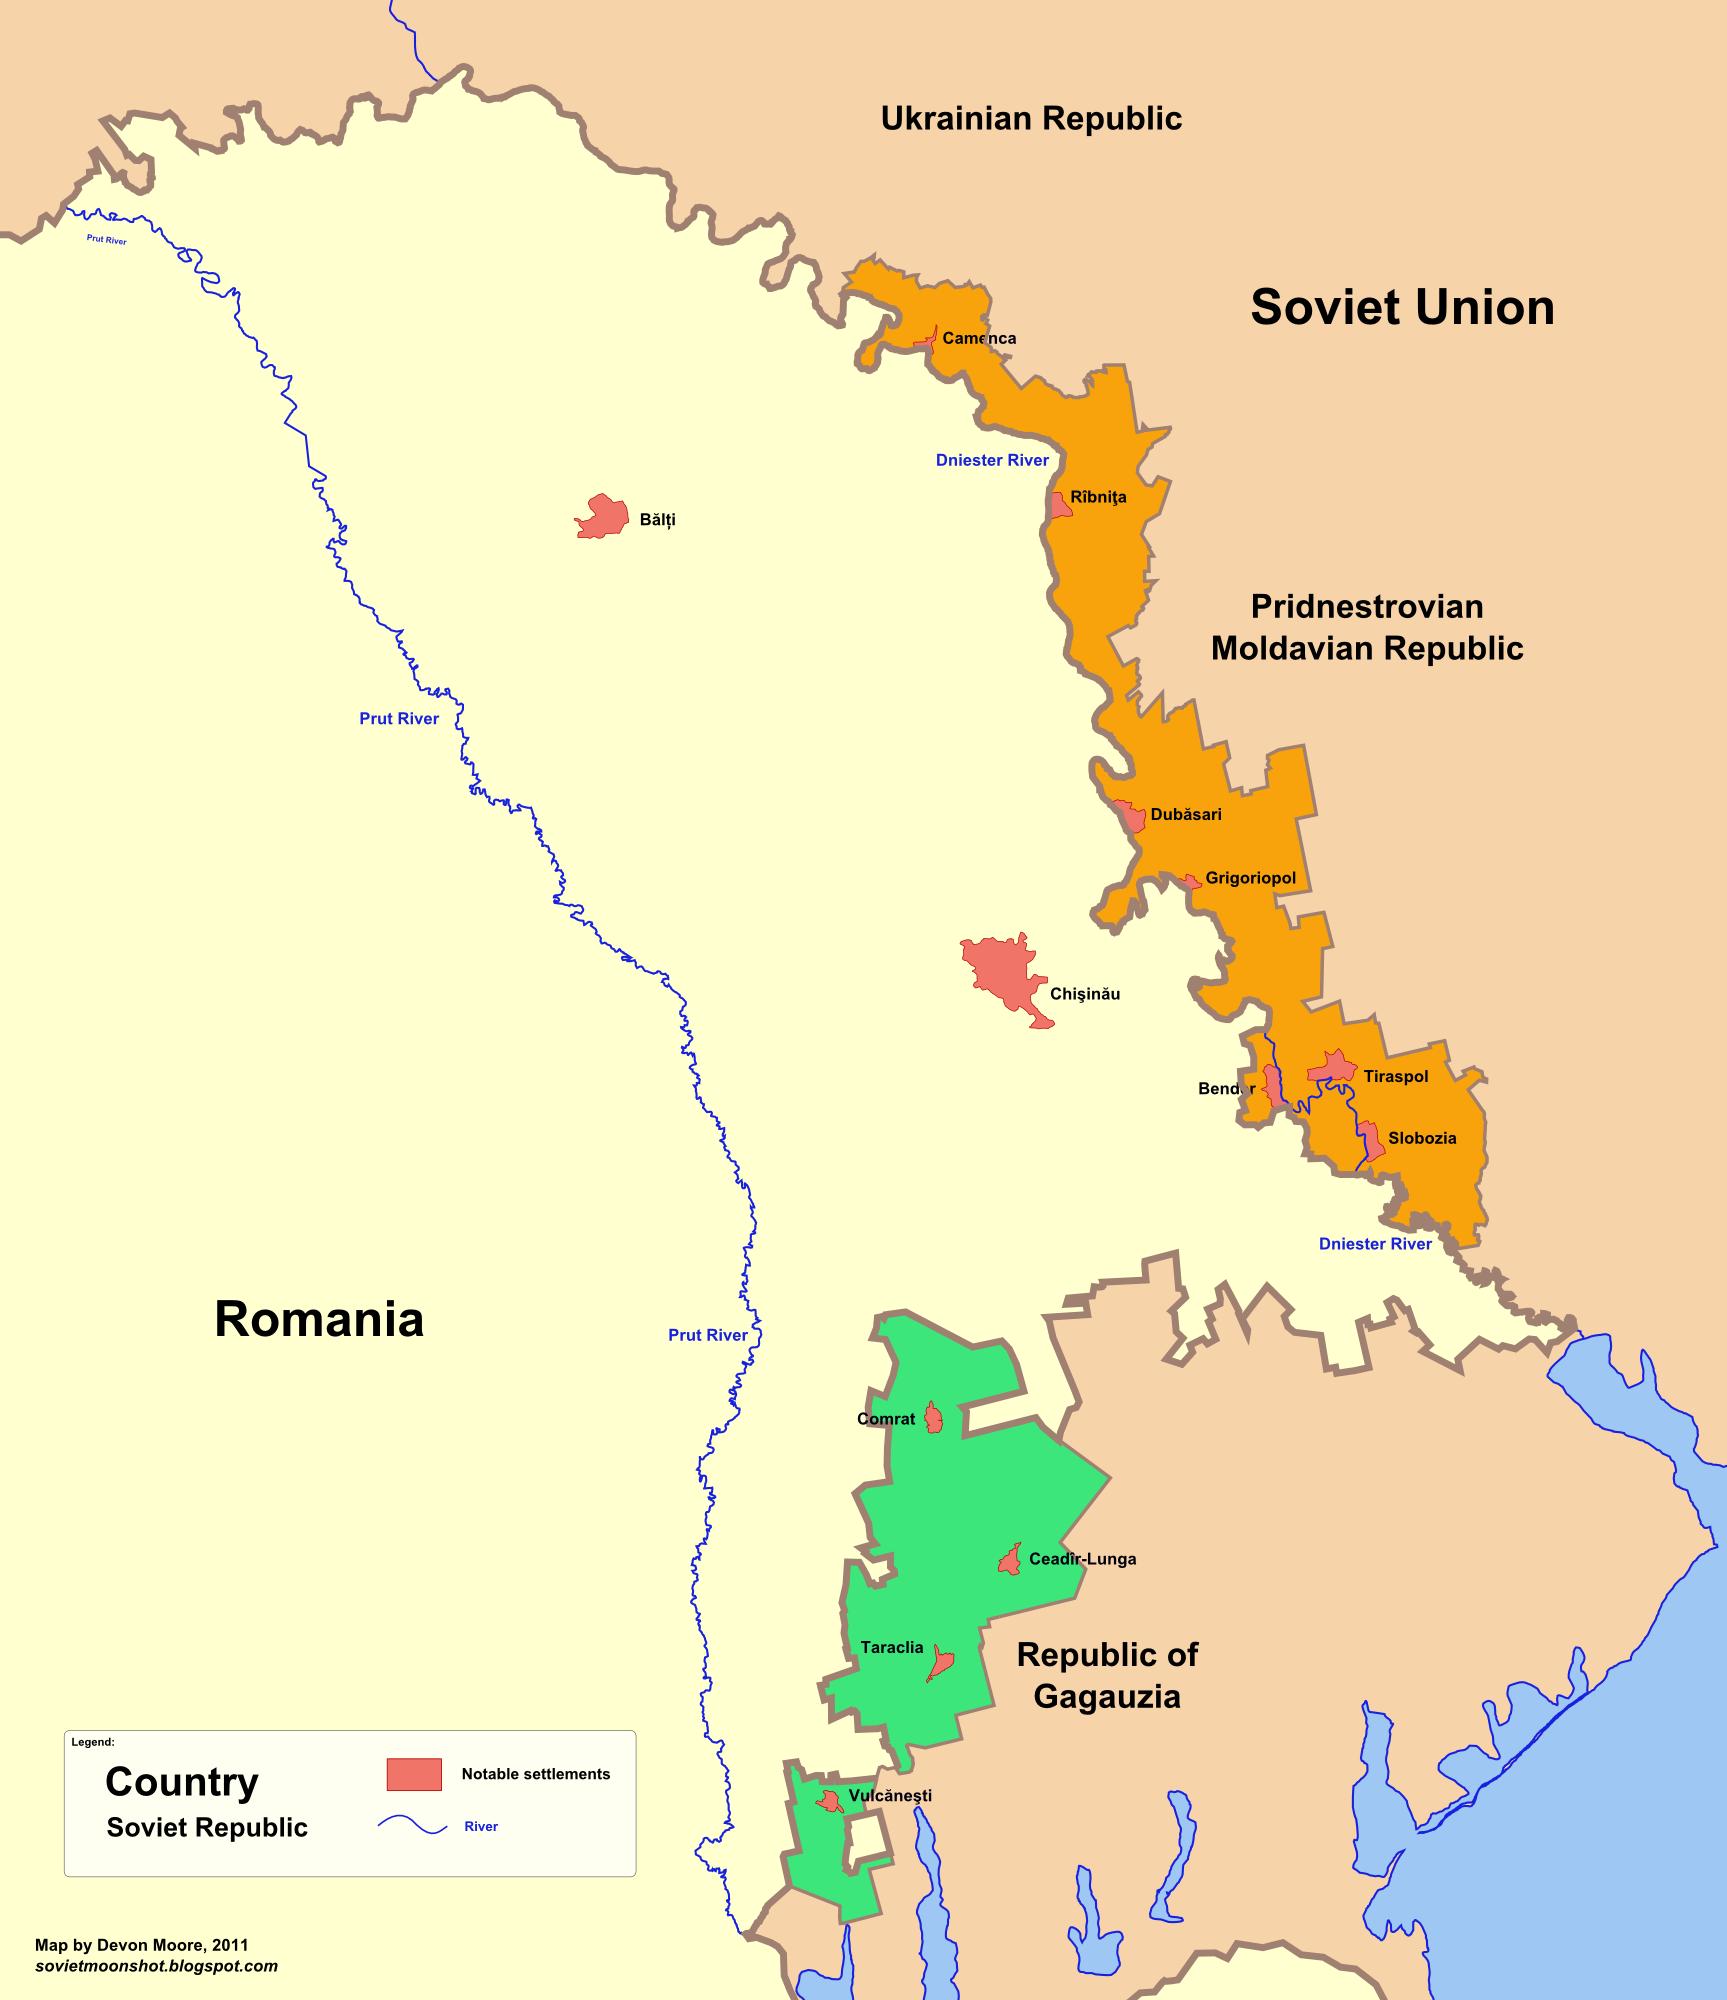 Gagauzia-Moldova-Pridnestrovie